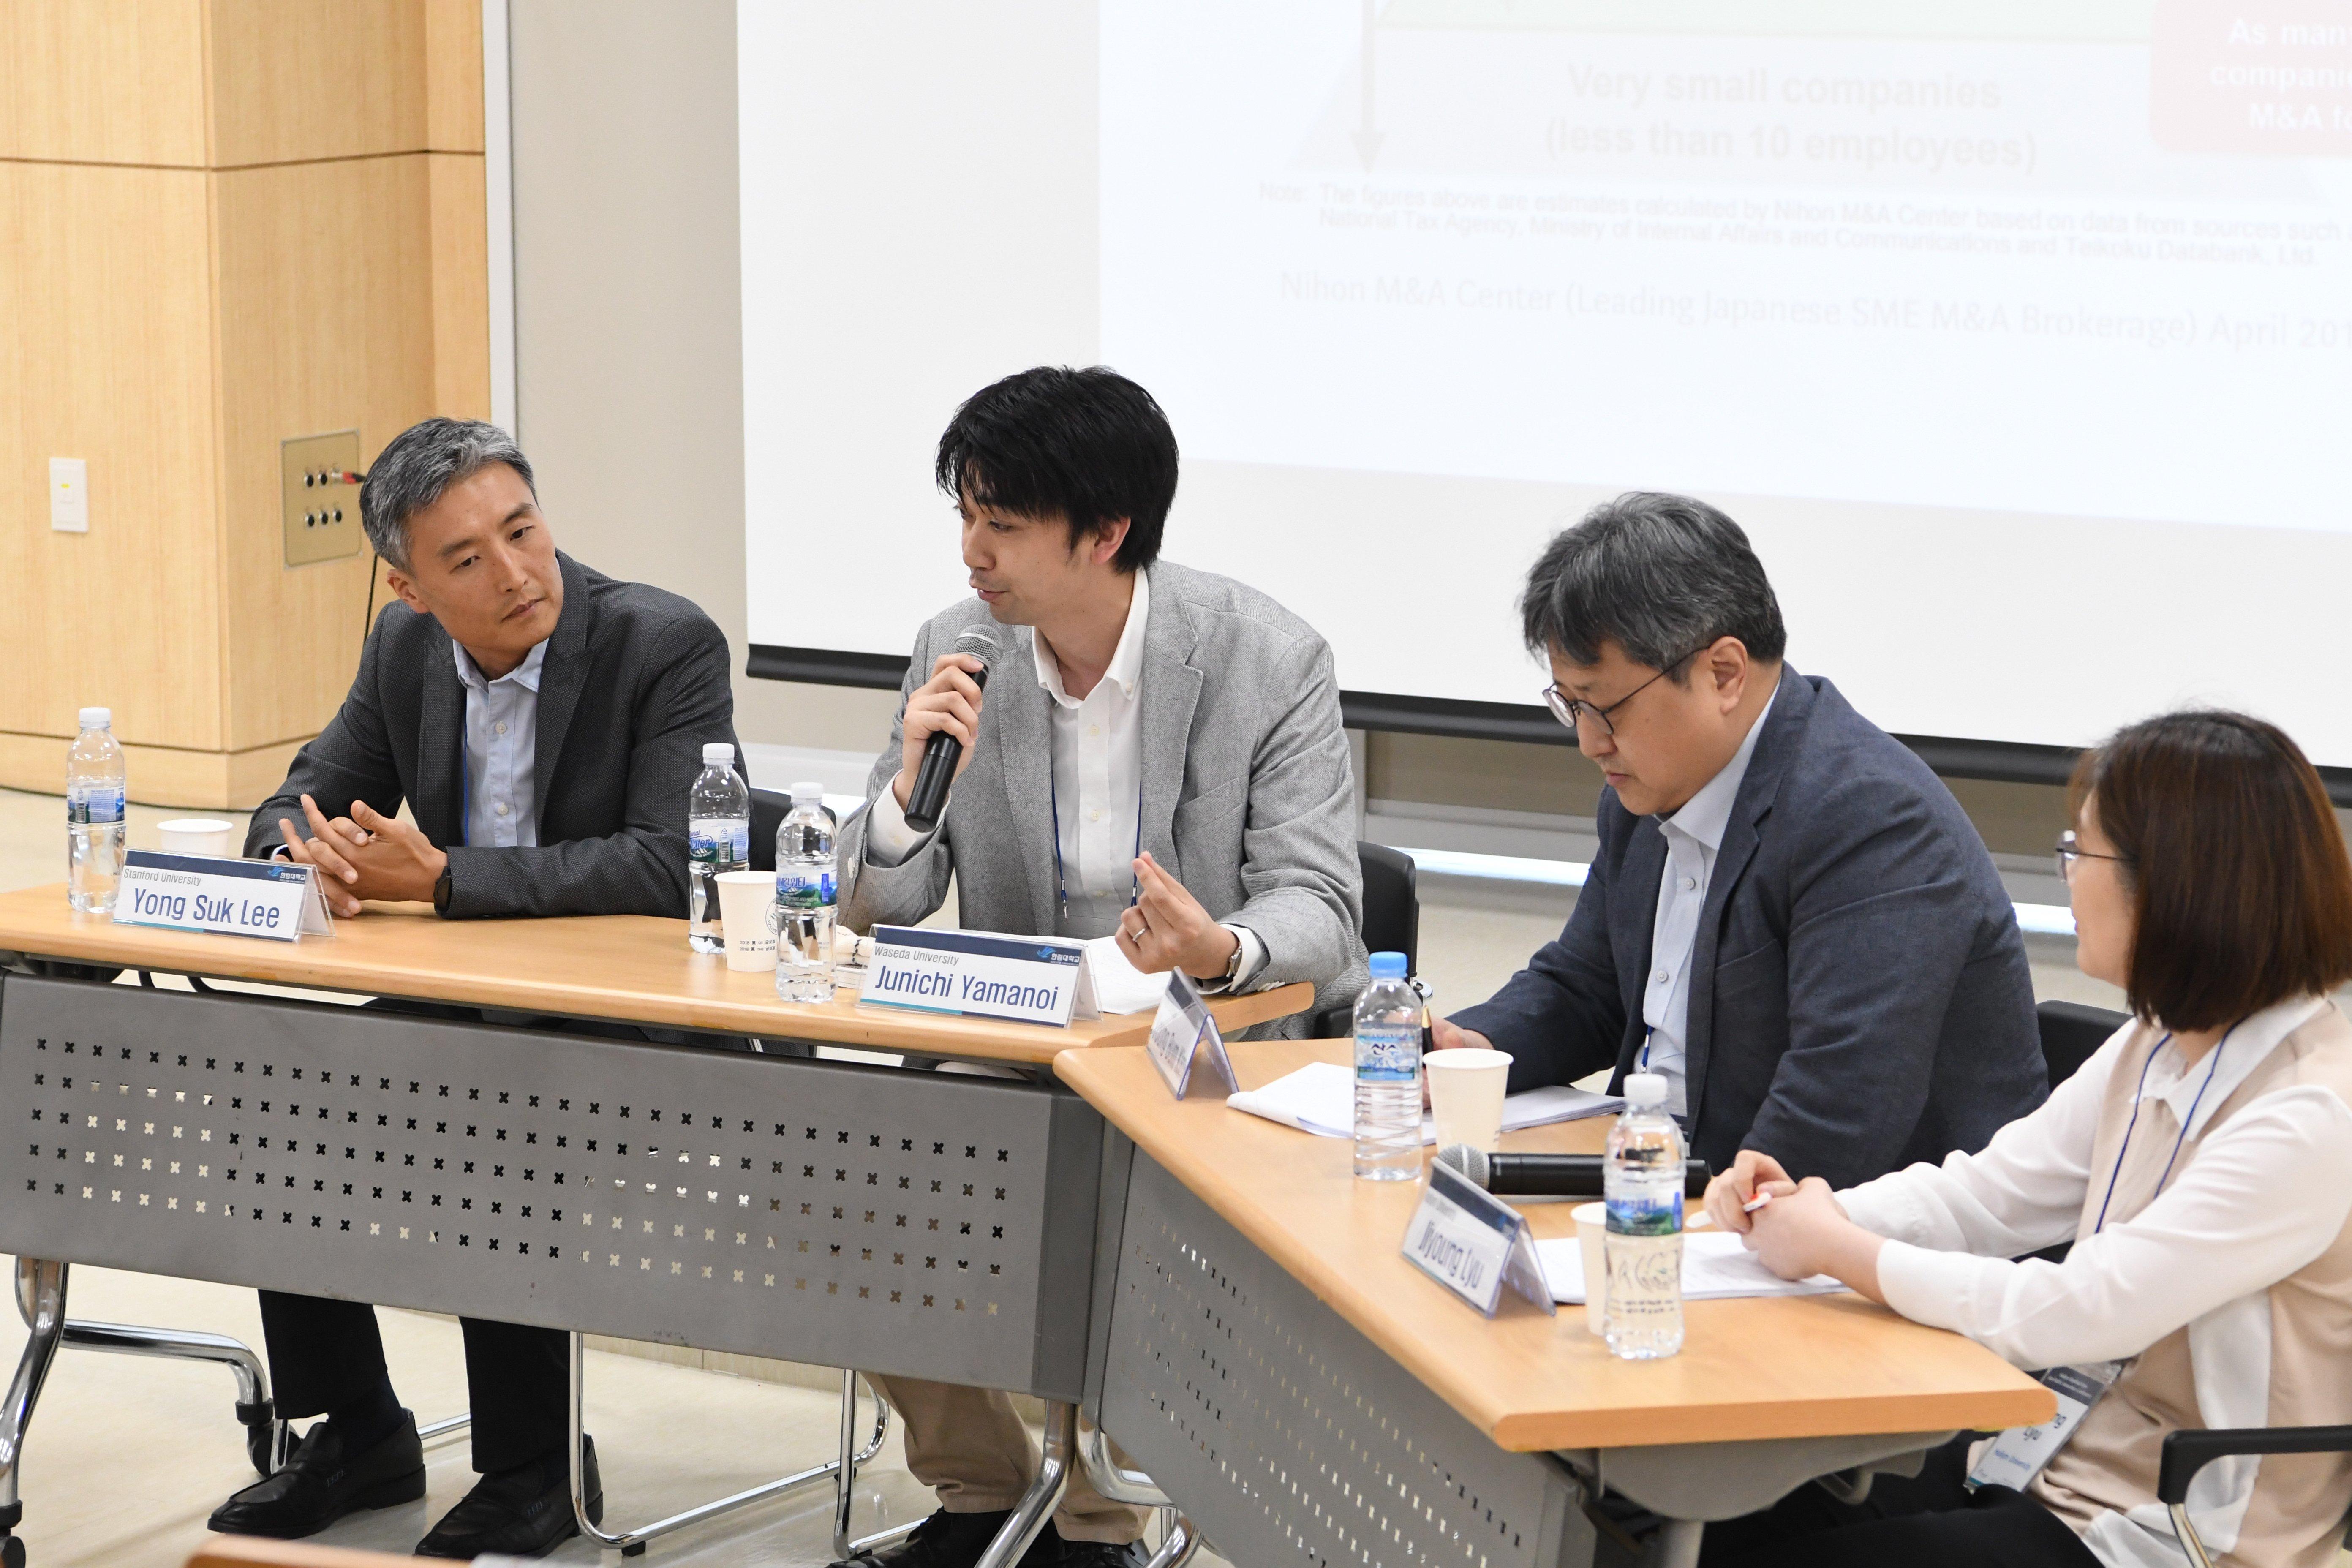 Yong Suk Lee , Junichi Yamanoi , Young-Bum Kim, and Jiyoung Liu seated at a table